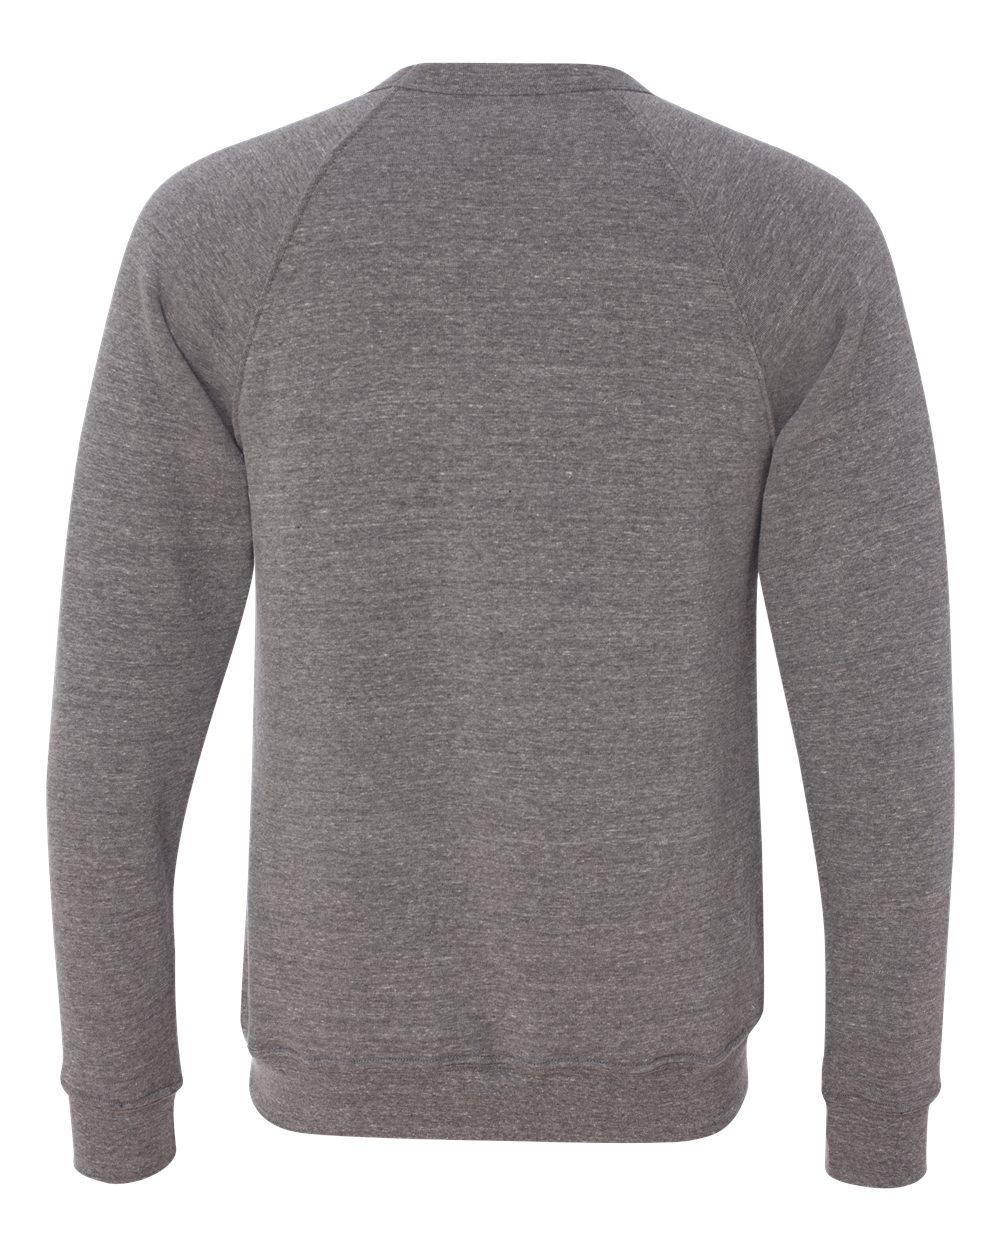 Bella-Canvas-Unisex-Sponge-Fleece-Crewneck-Sweatshirt-Top-Blank-3901-up-to-2XL thumbnail 30